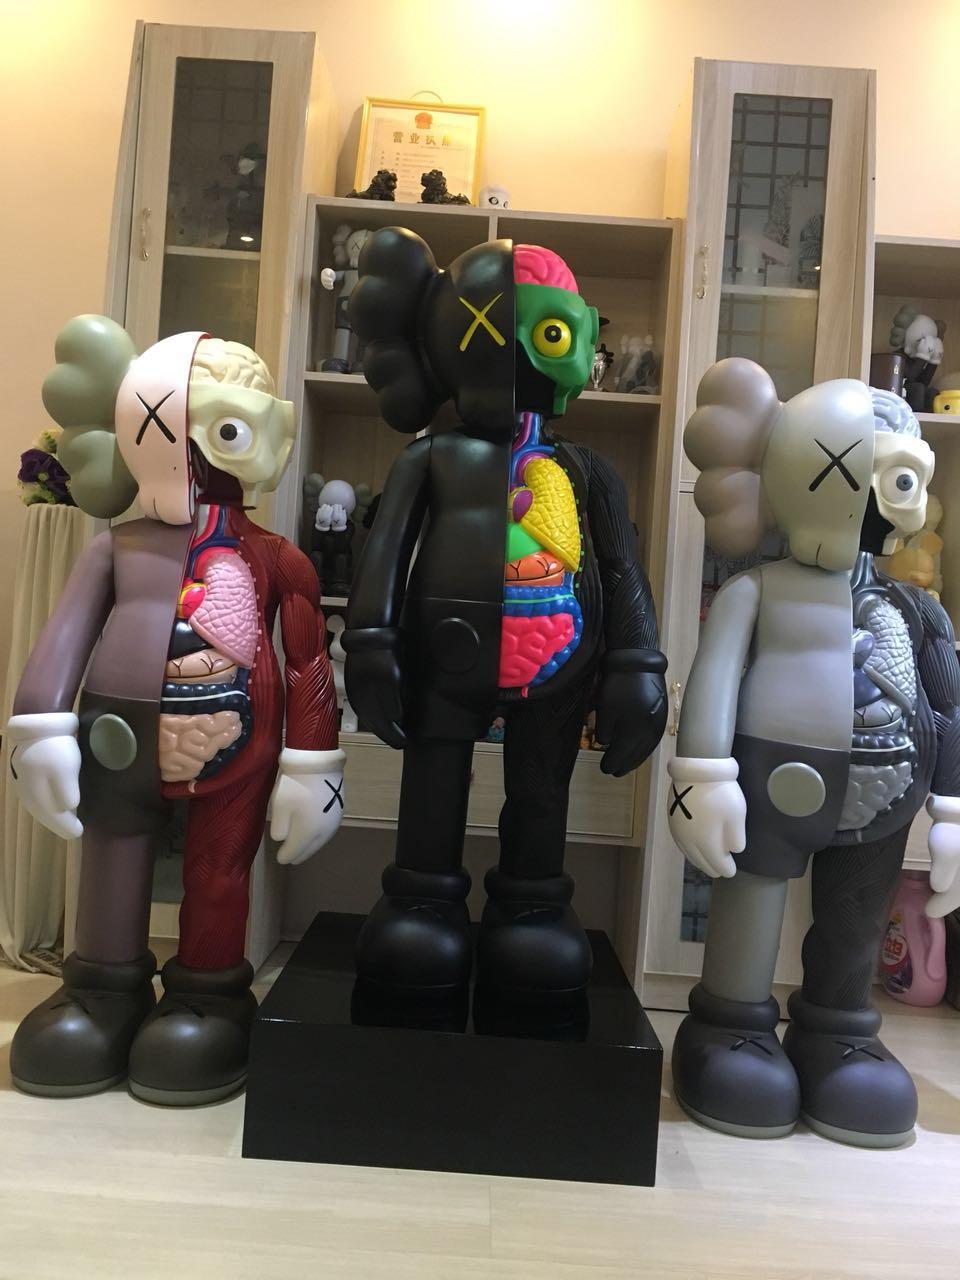 [Nuevo] Original fake KAWS 130 cm 4ft kaws dissected 1:1 colección figuras de acción juguete modelo Original decoración del hogar regalo